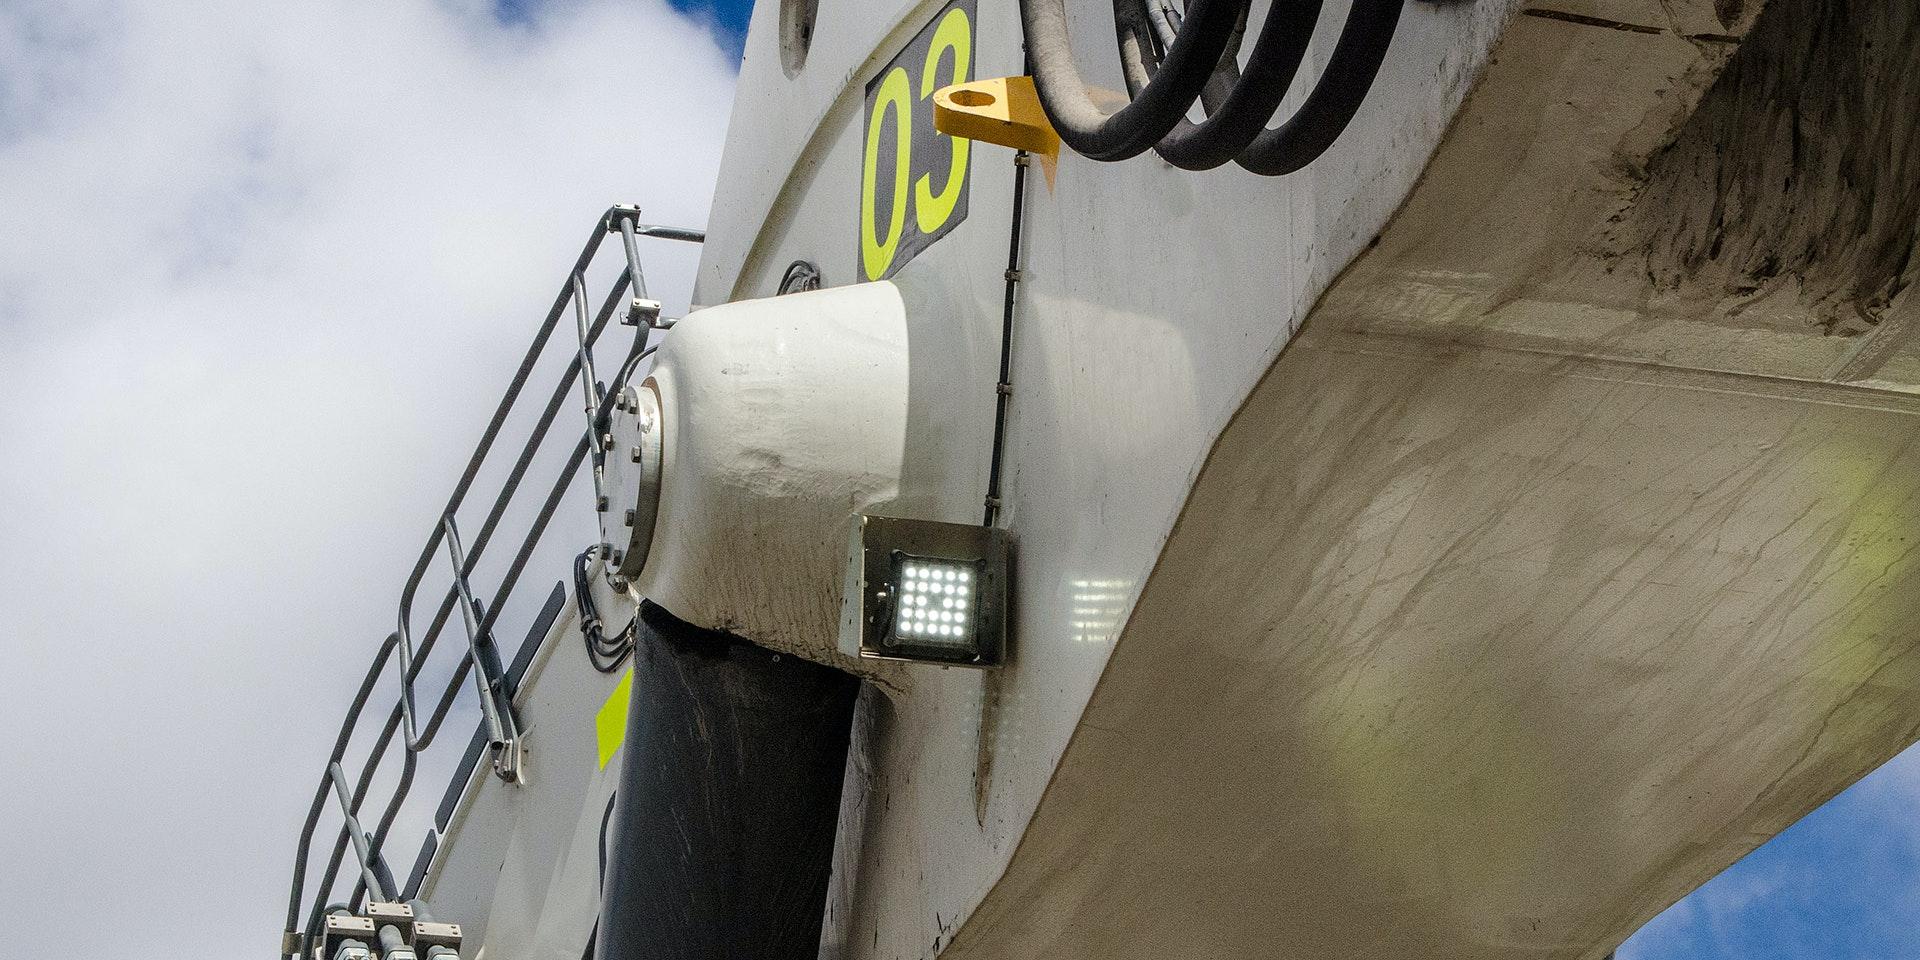 CP24 LED Flood Light in application, installed on 996 Liebherr excavator